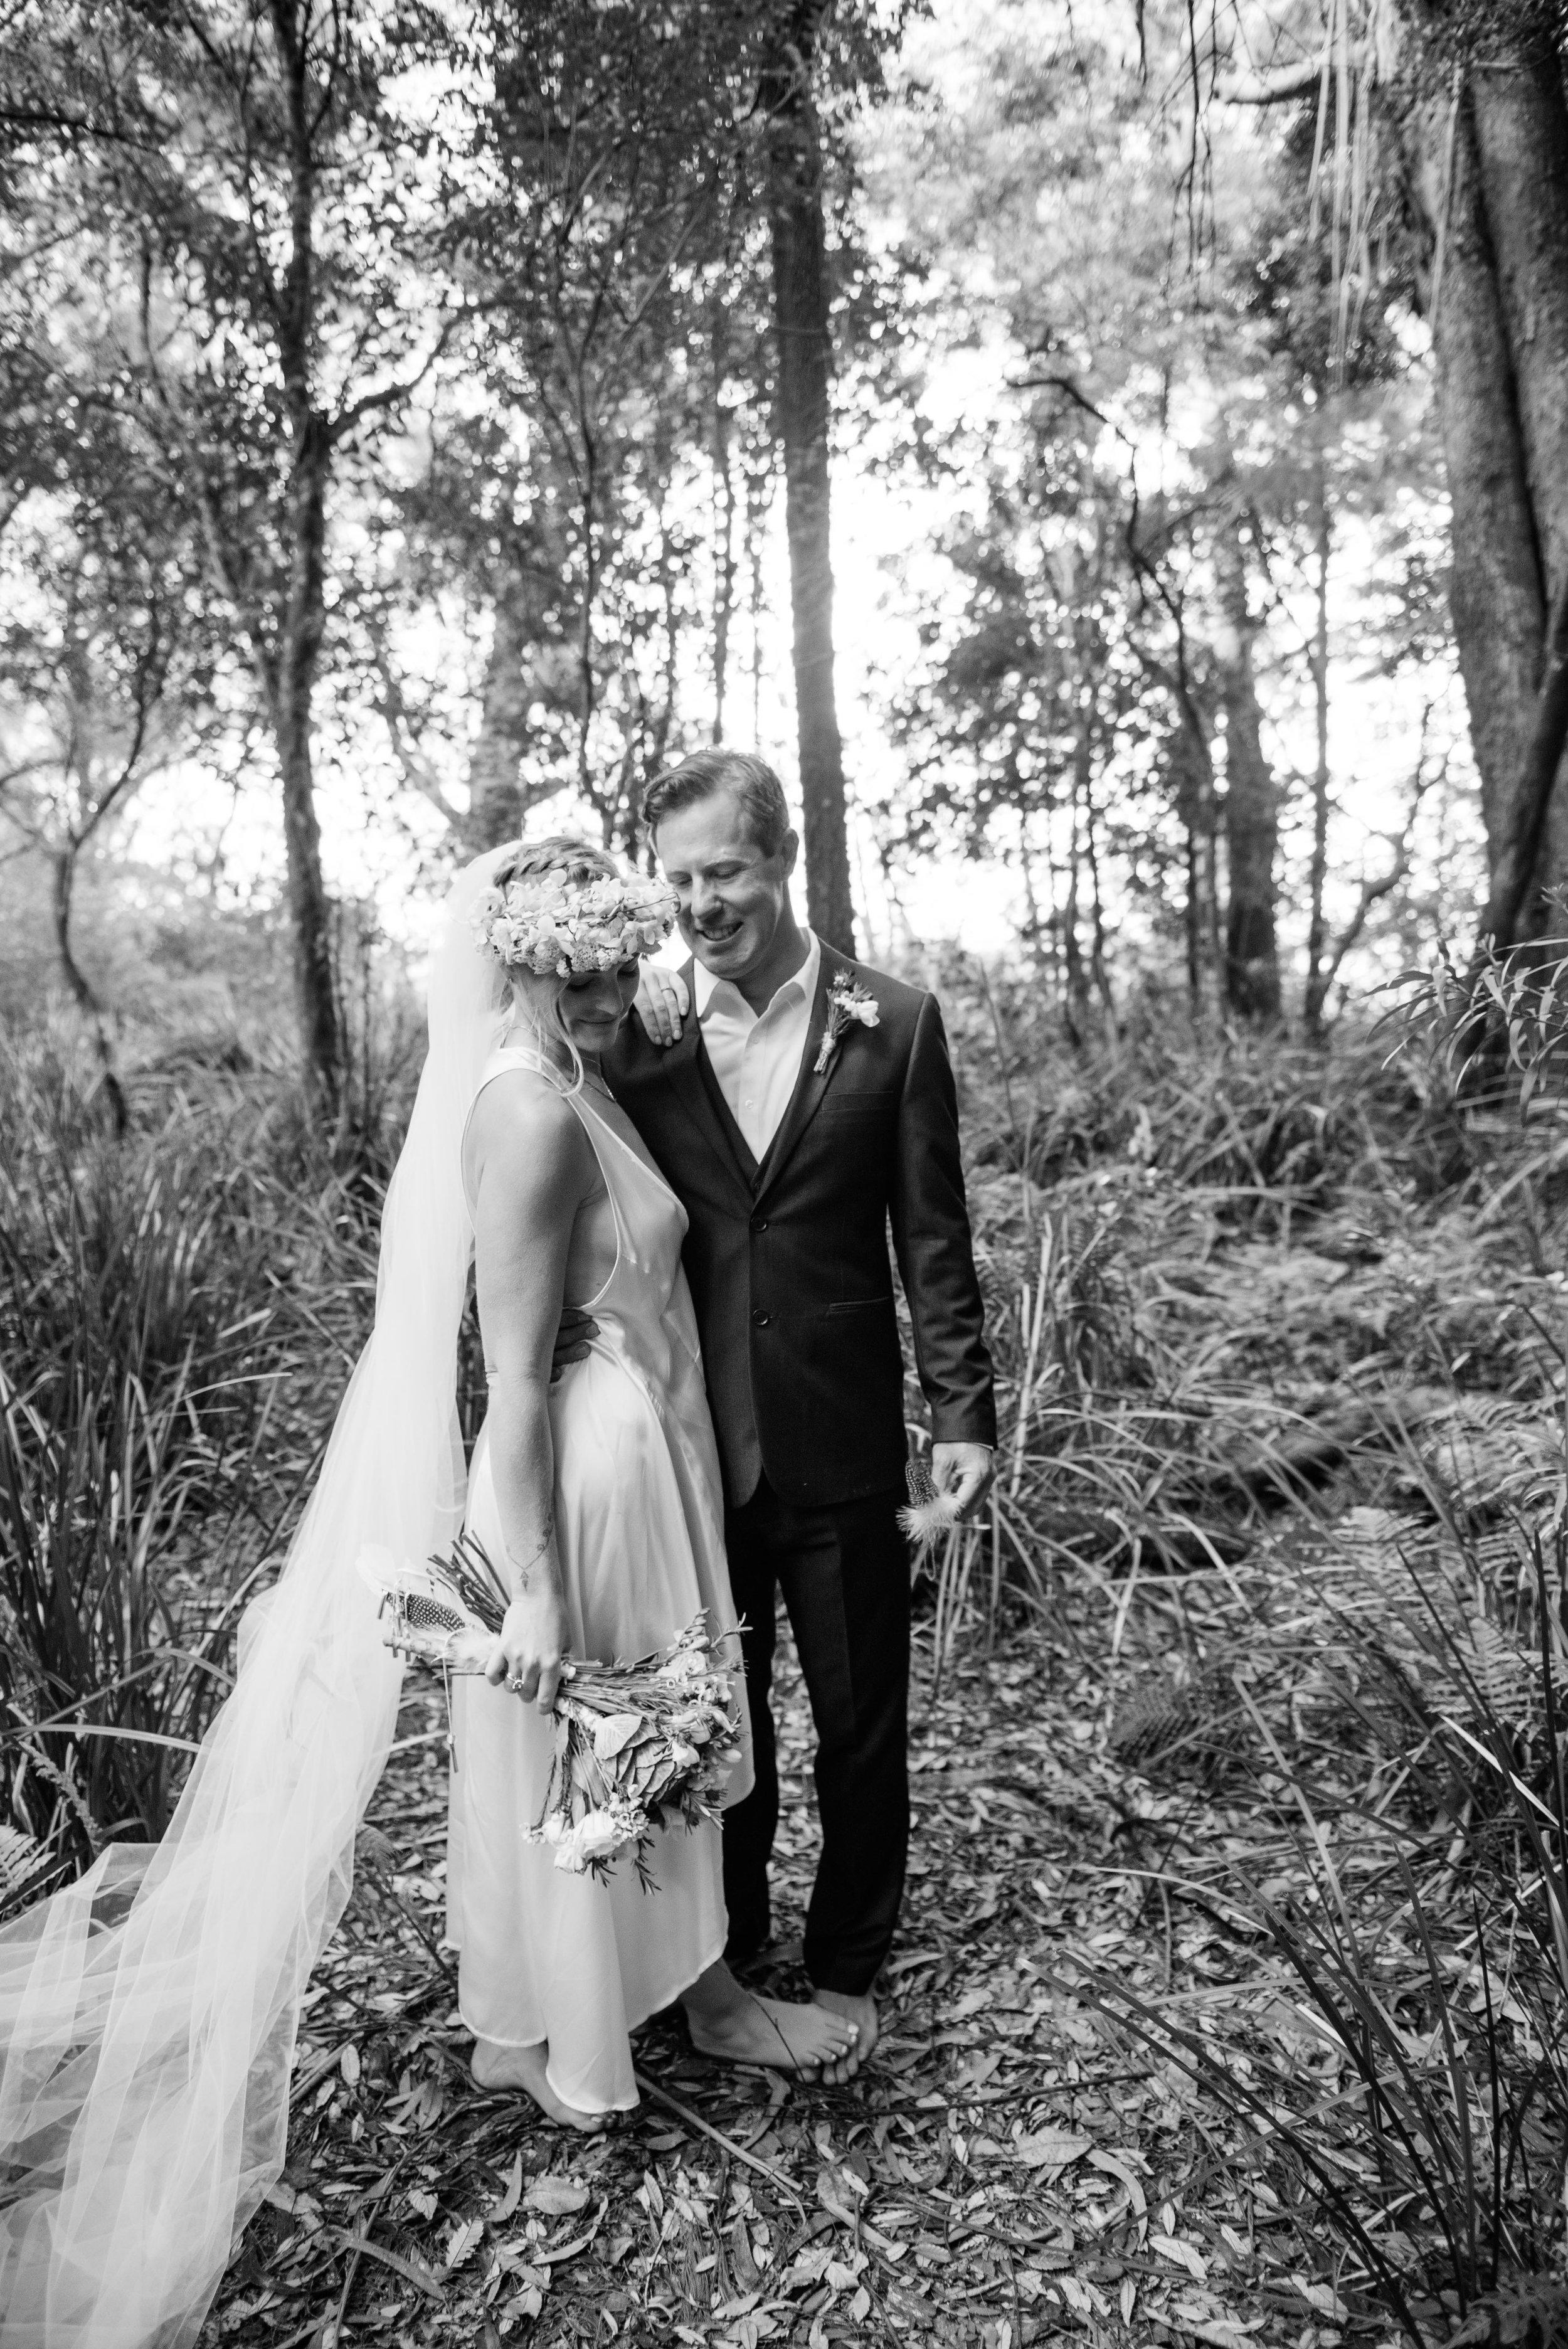 Carla and Luke- wedding photographer, byron bay wedding and family photographer, tweed heads wedding and family photography-332.jpg